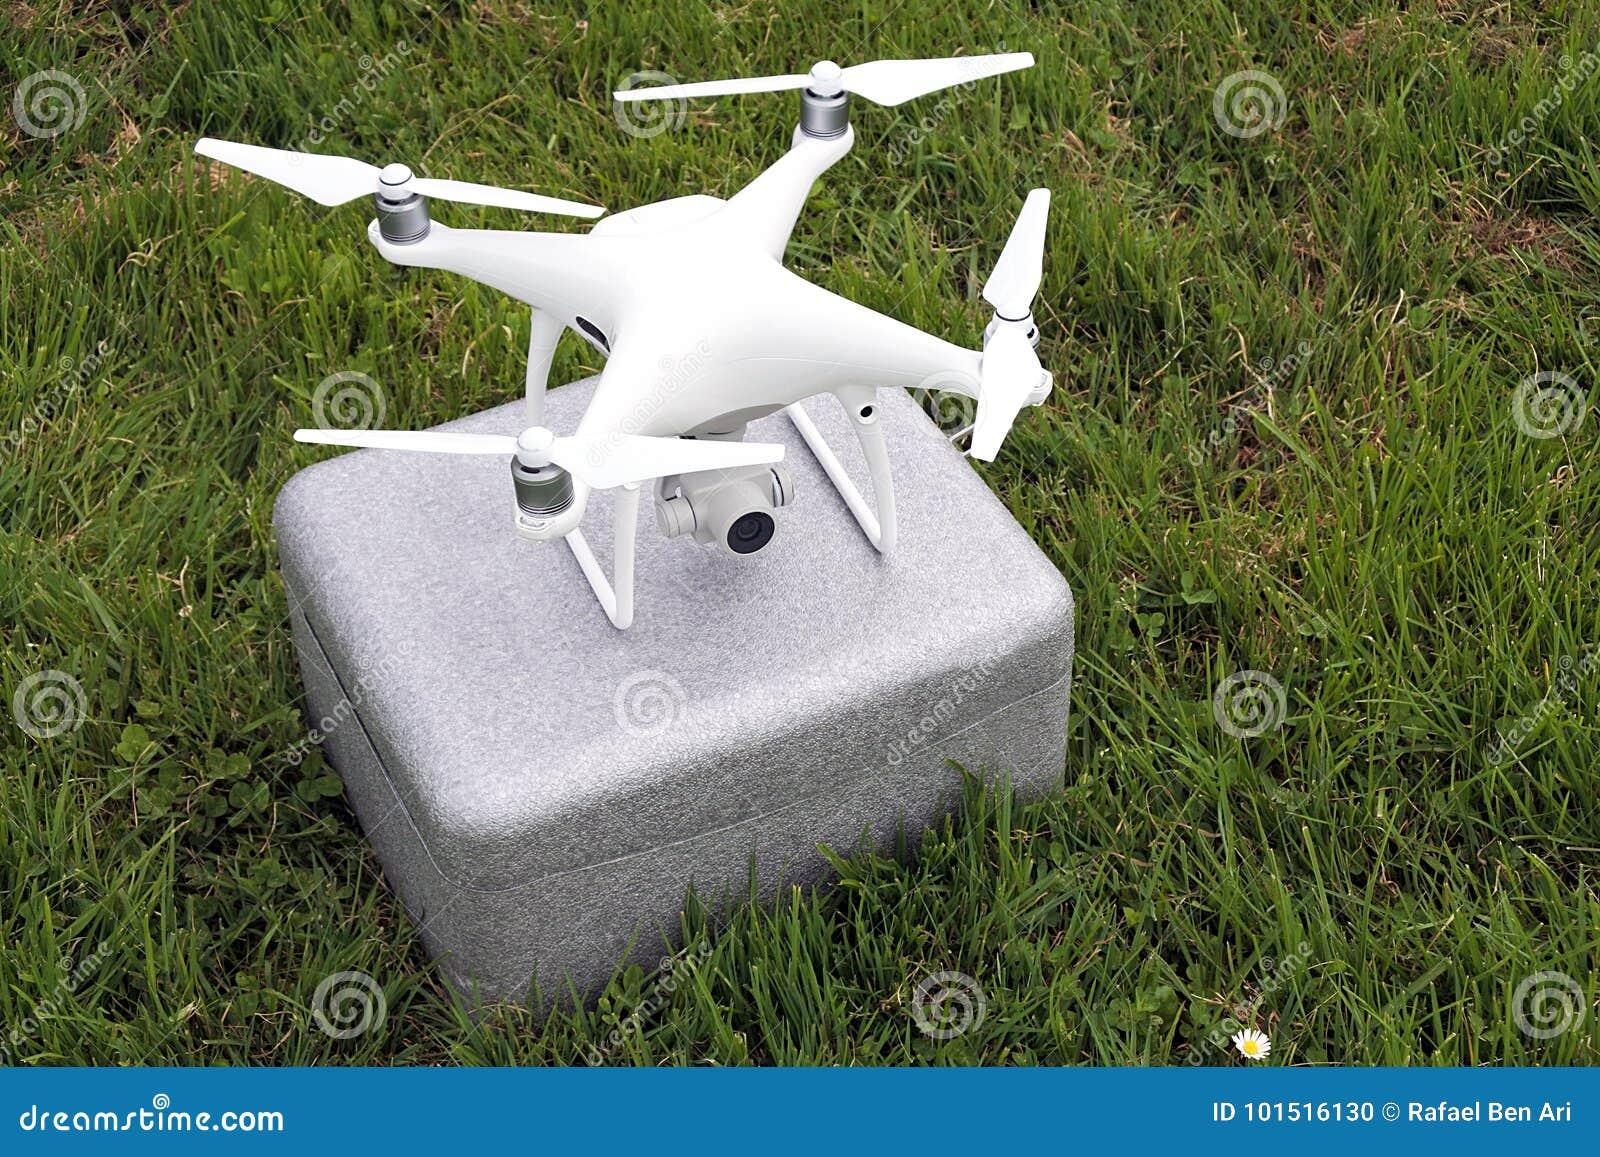 Personal drone